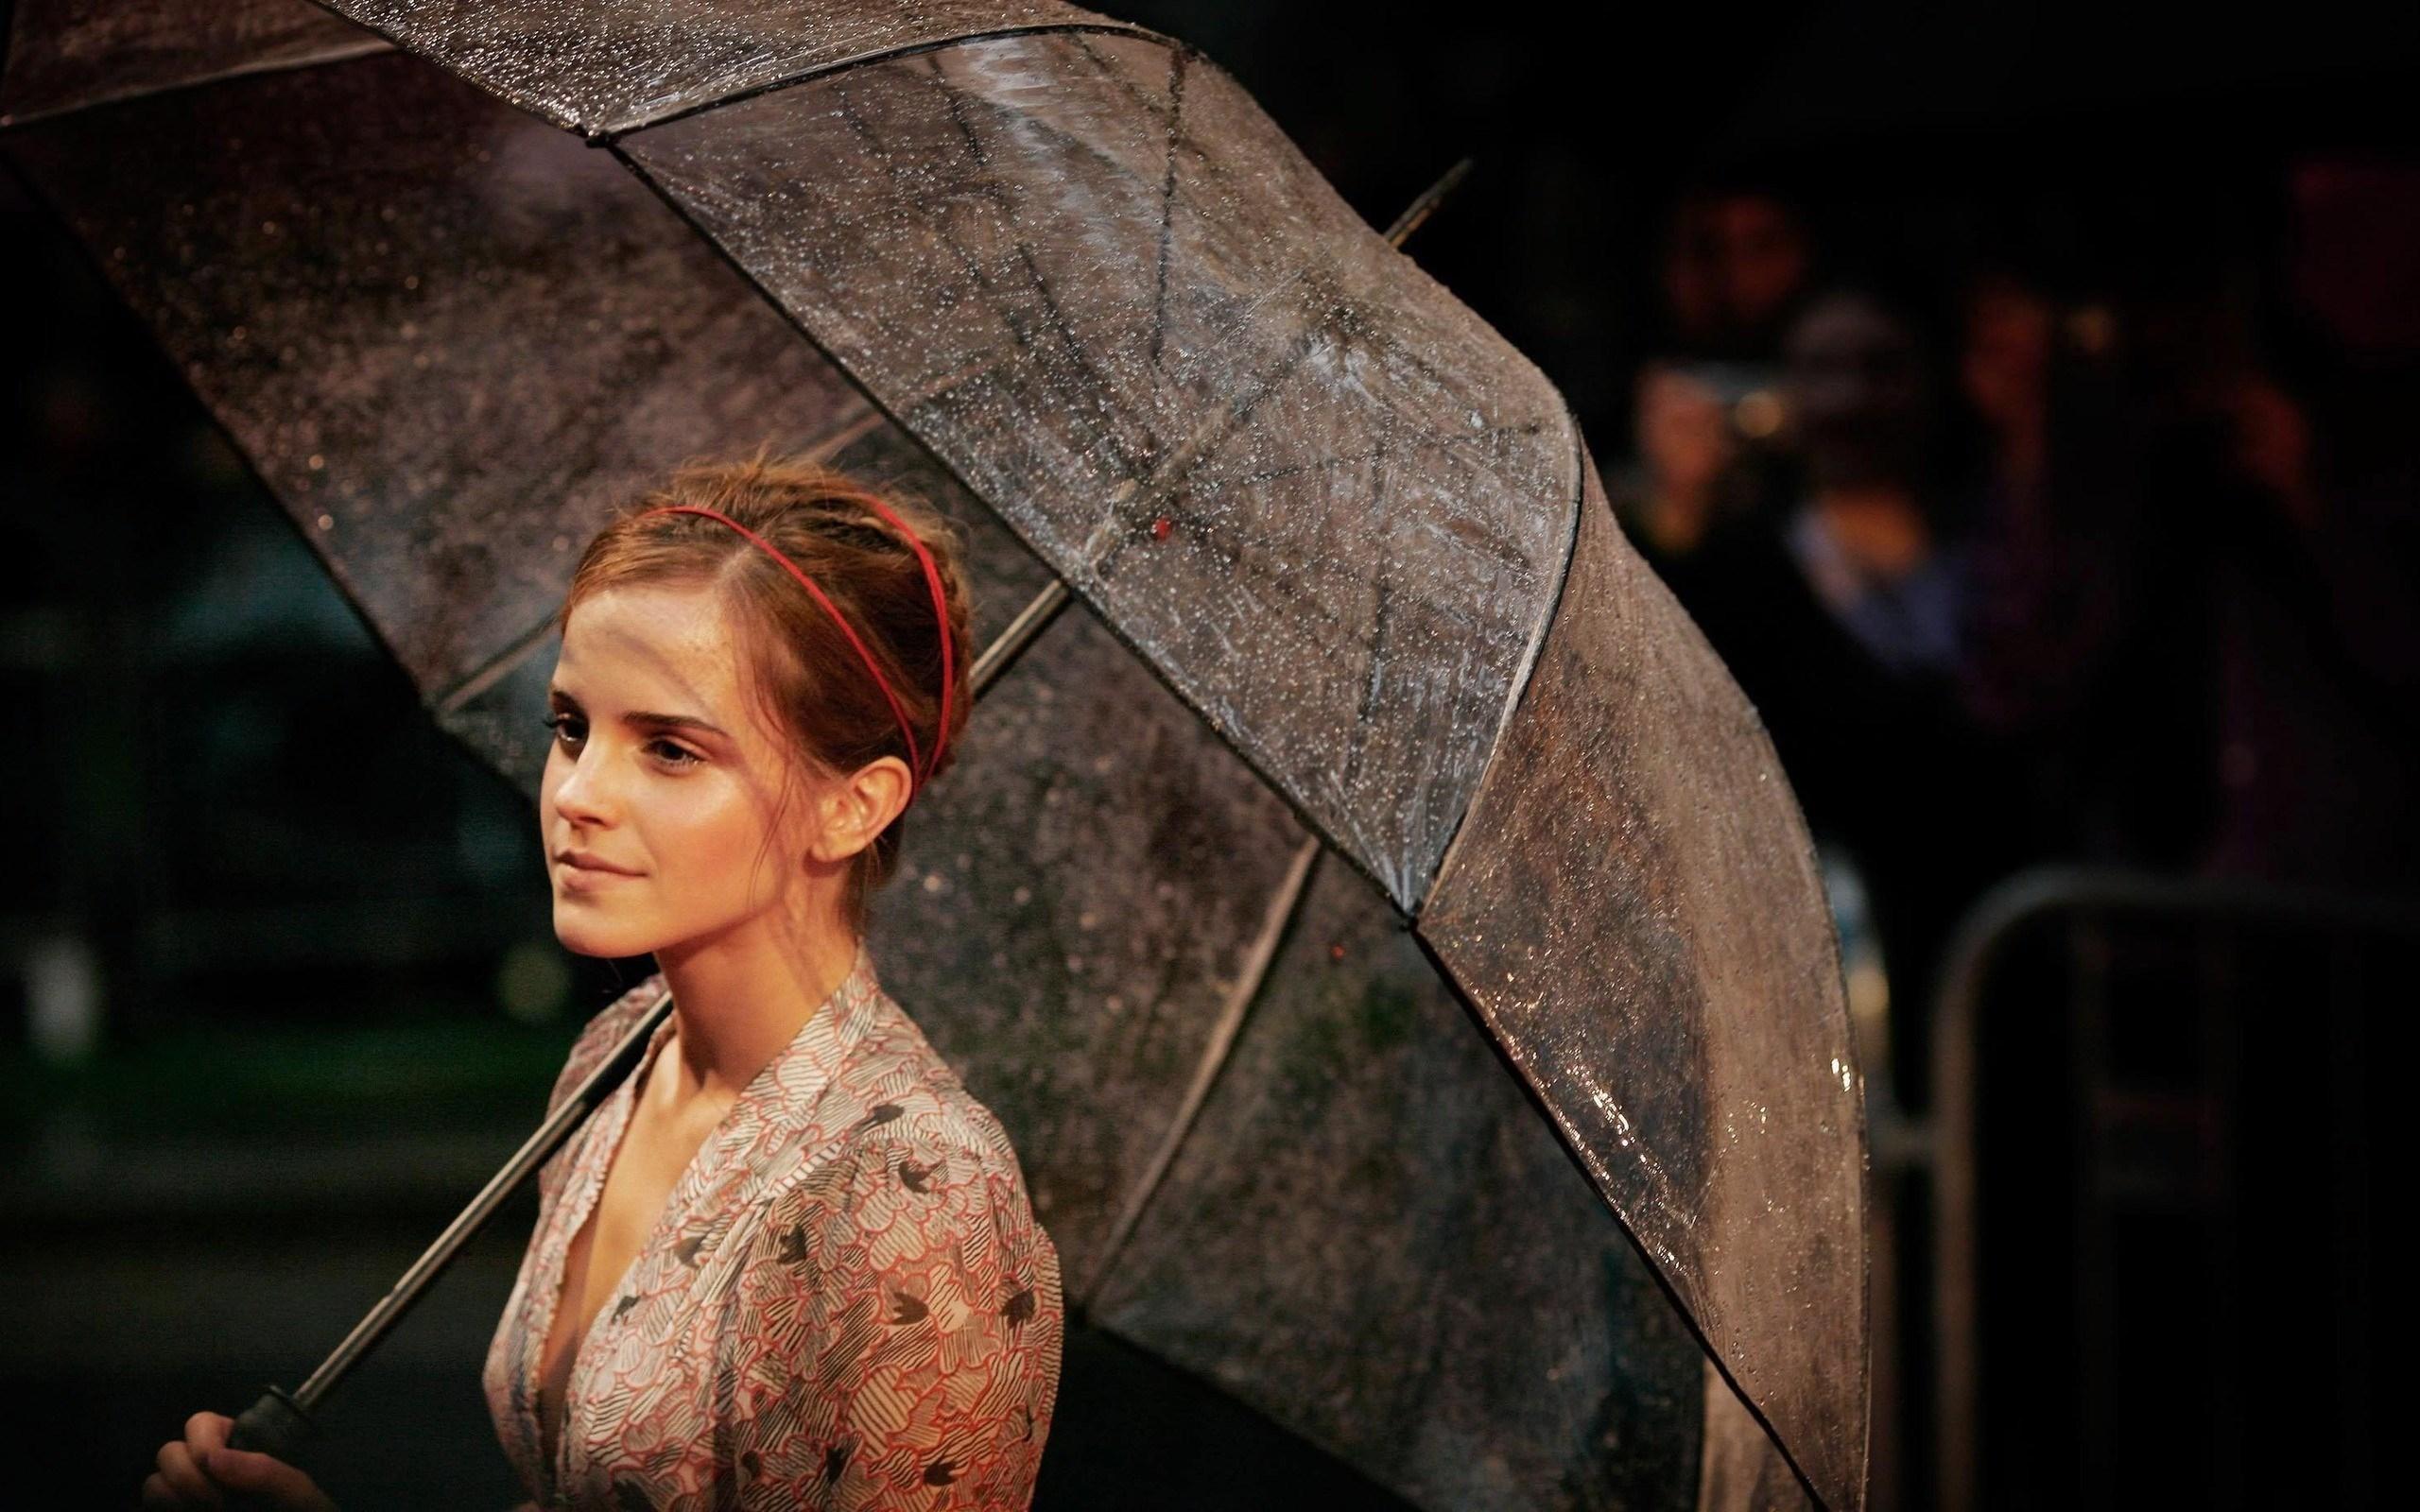 Wallpaper Of Little Girl In Bajrangi Bhaijaan Emma Watson Hd Wallpapers 49 60 Popopics Com